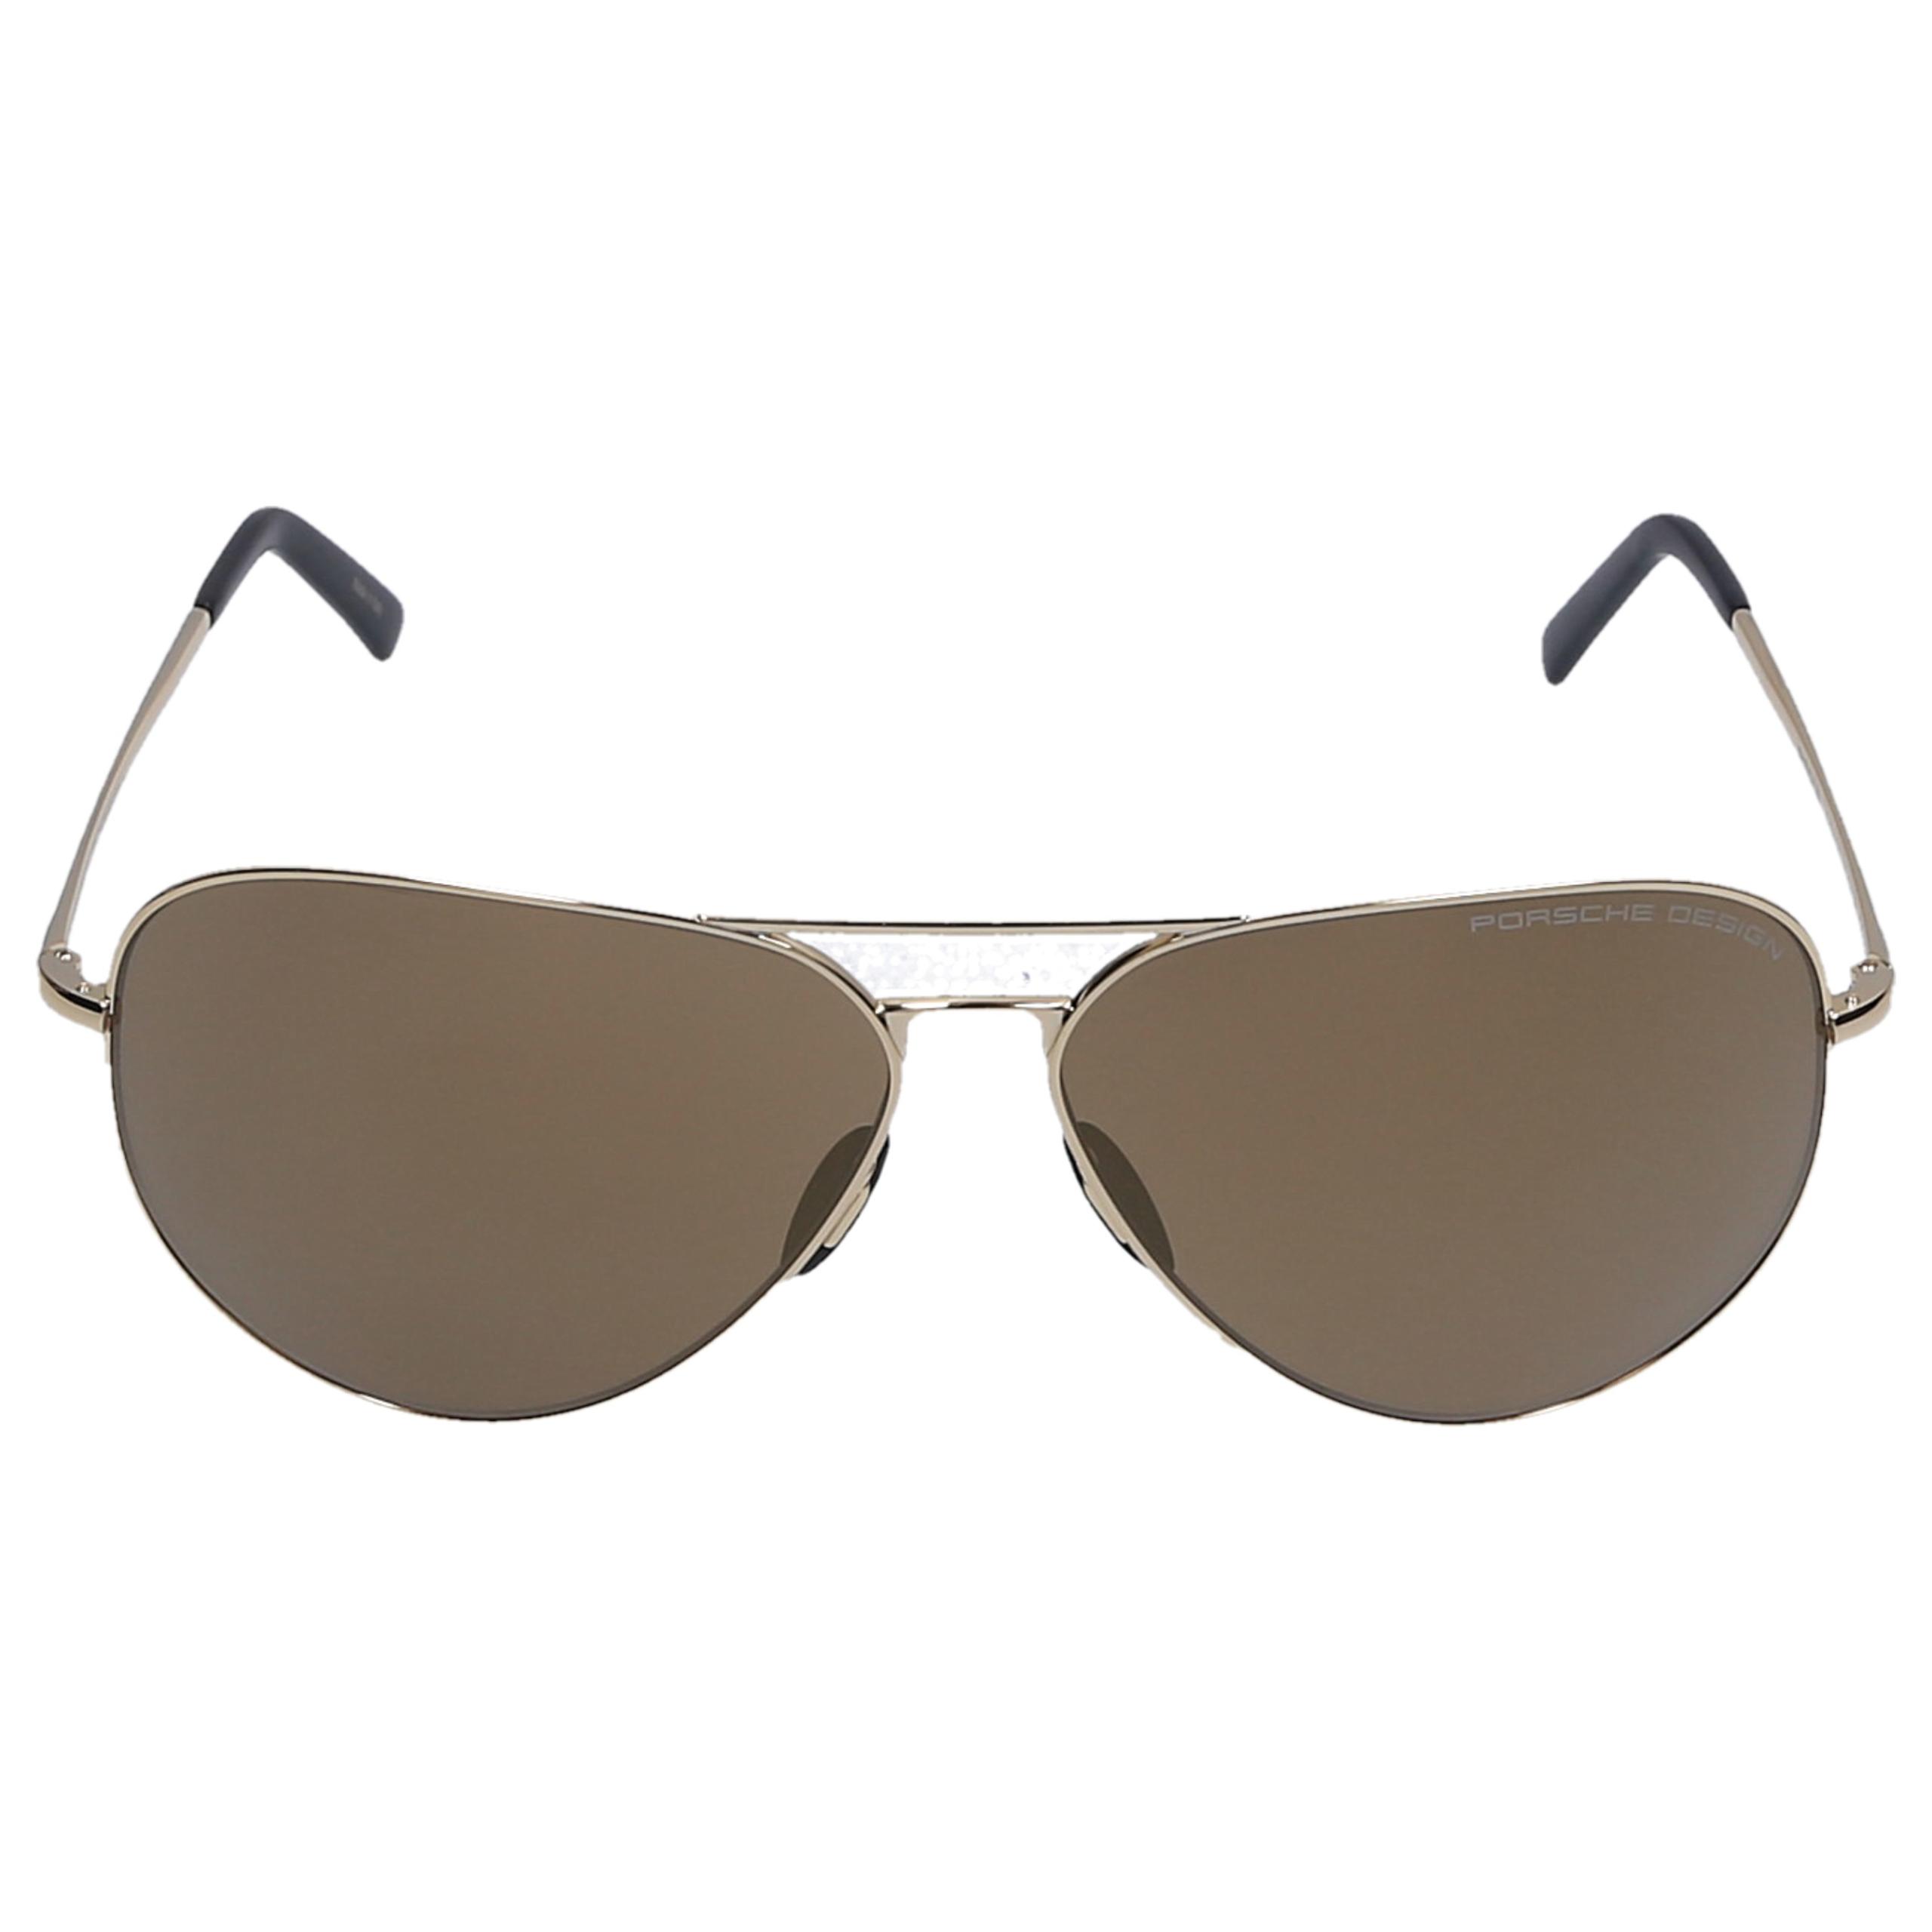 Sonnenbrille Aviator P8508 E 64/12 Metall gold